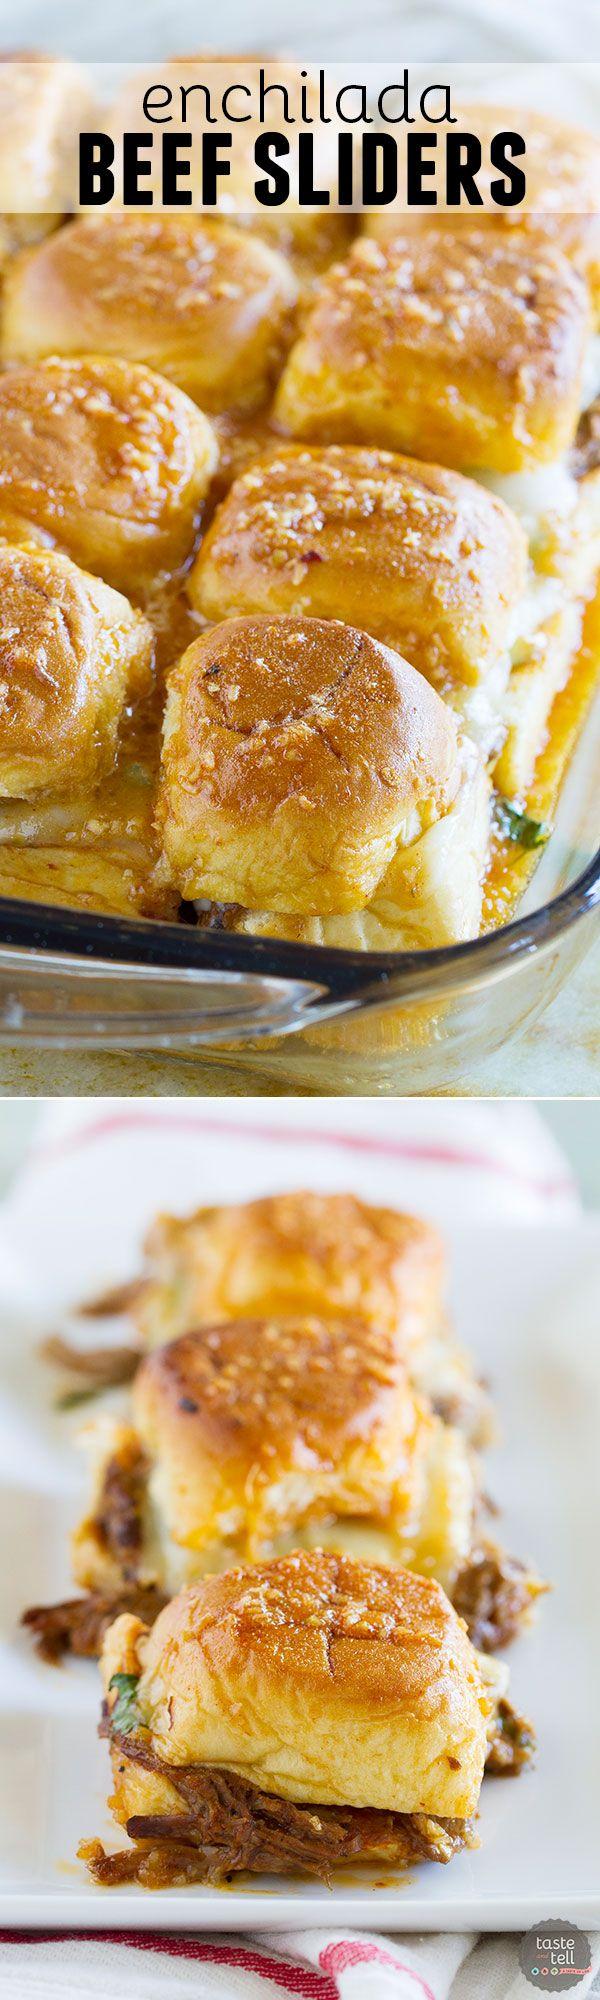 203 best images about slider recipes on pinterest sloppy joe